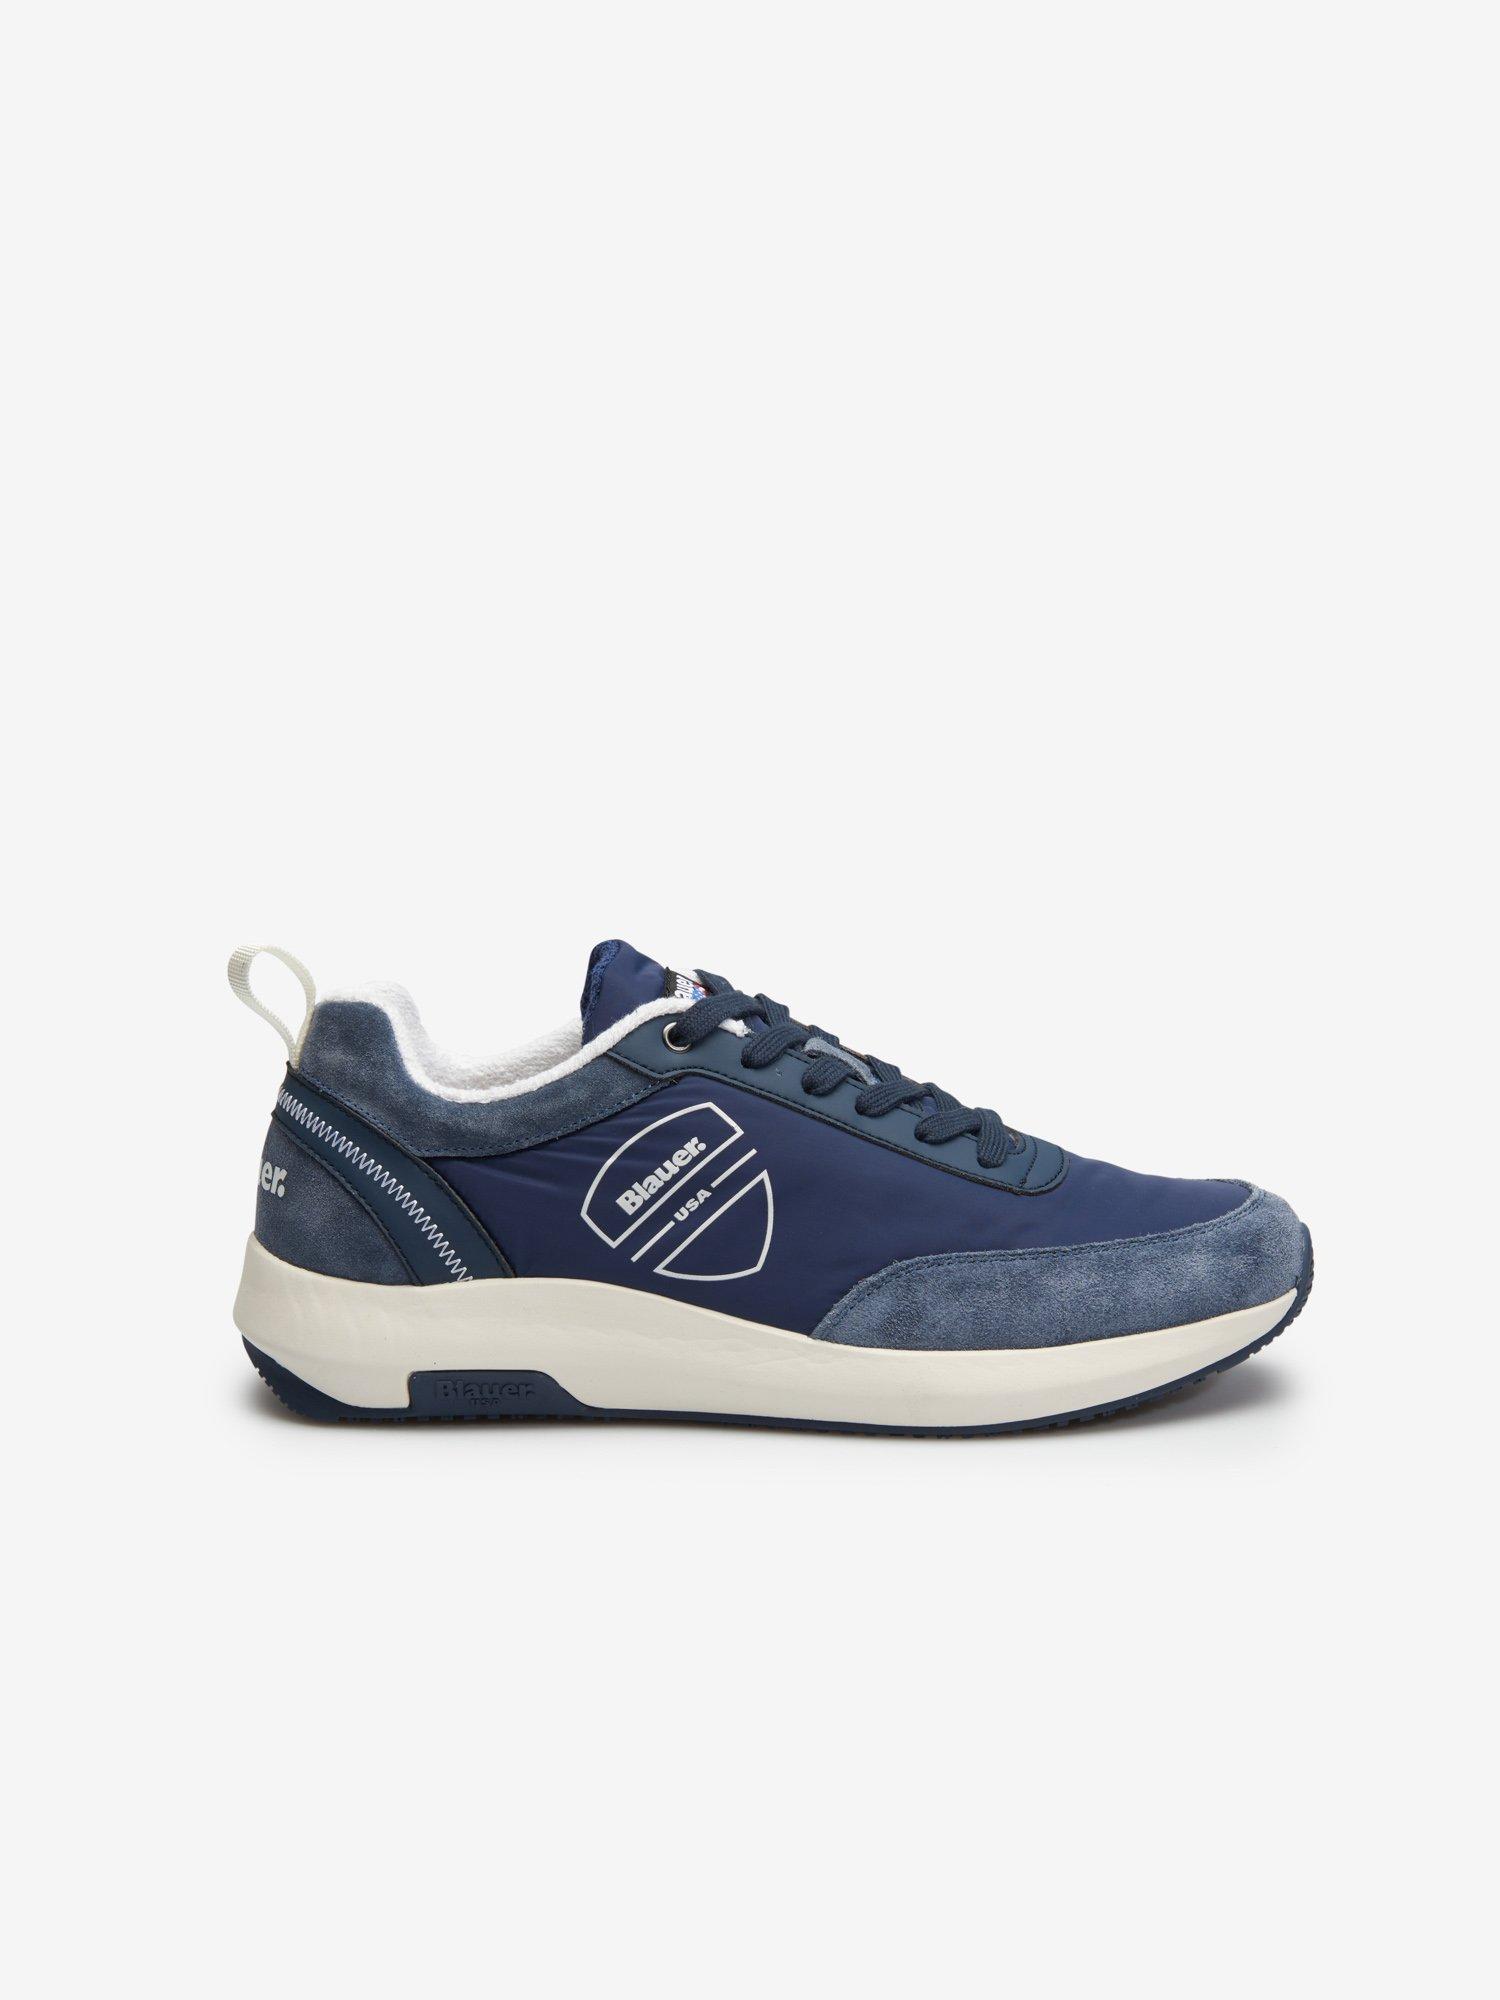 Byron Sneakers logo - Blauer